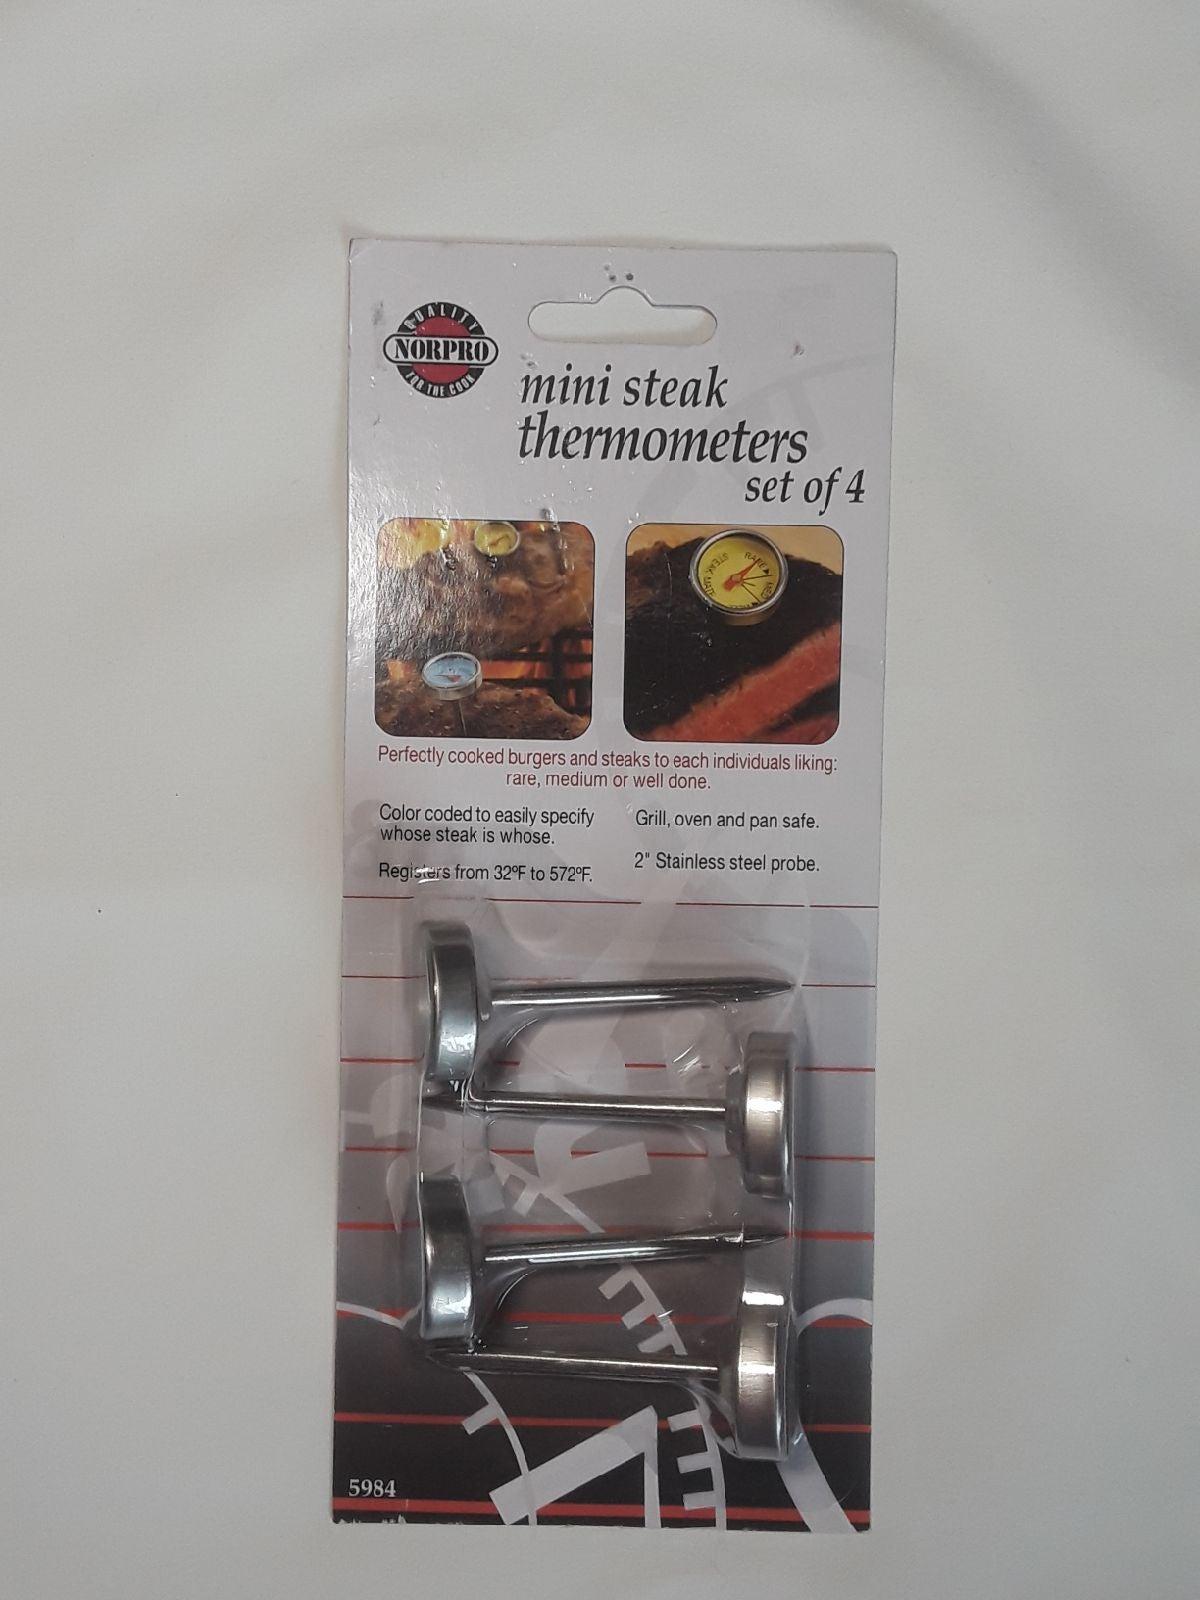 Mini Steak Thermometers